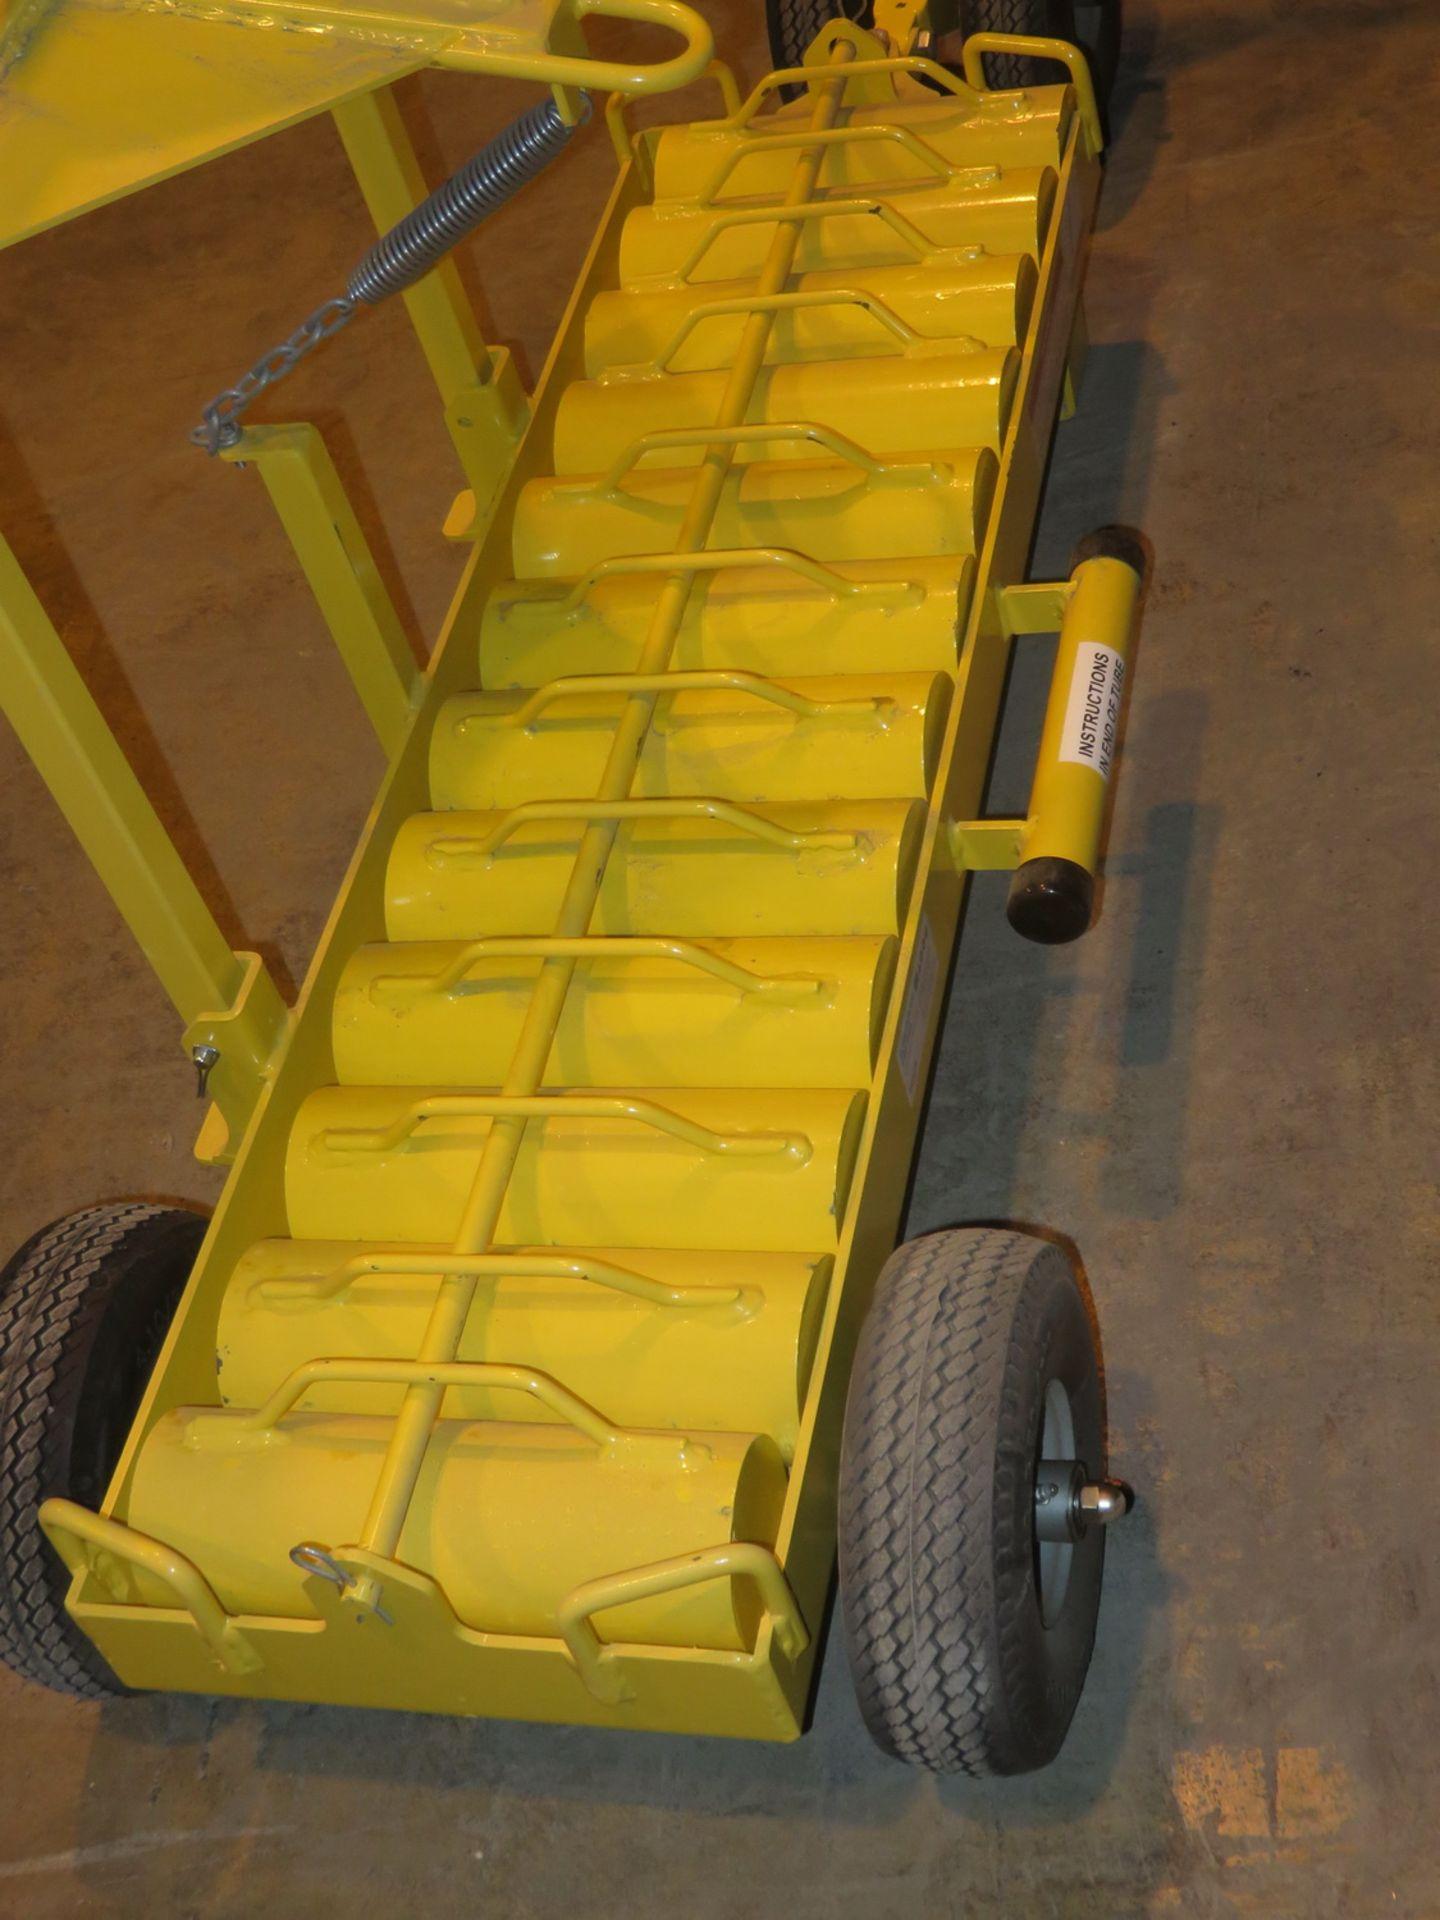 Lot 1 - NEW - SKYLINE MODEL 3005 ULTRA SAFE 600 PORTABLE ANCHOR POINT CART